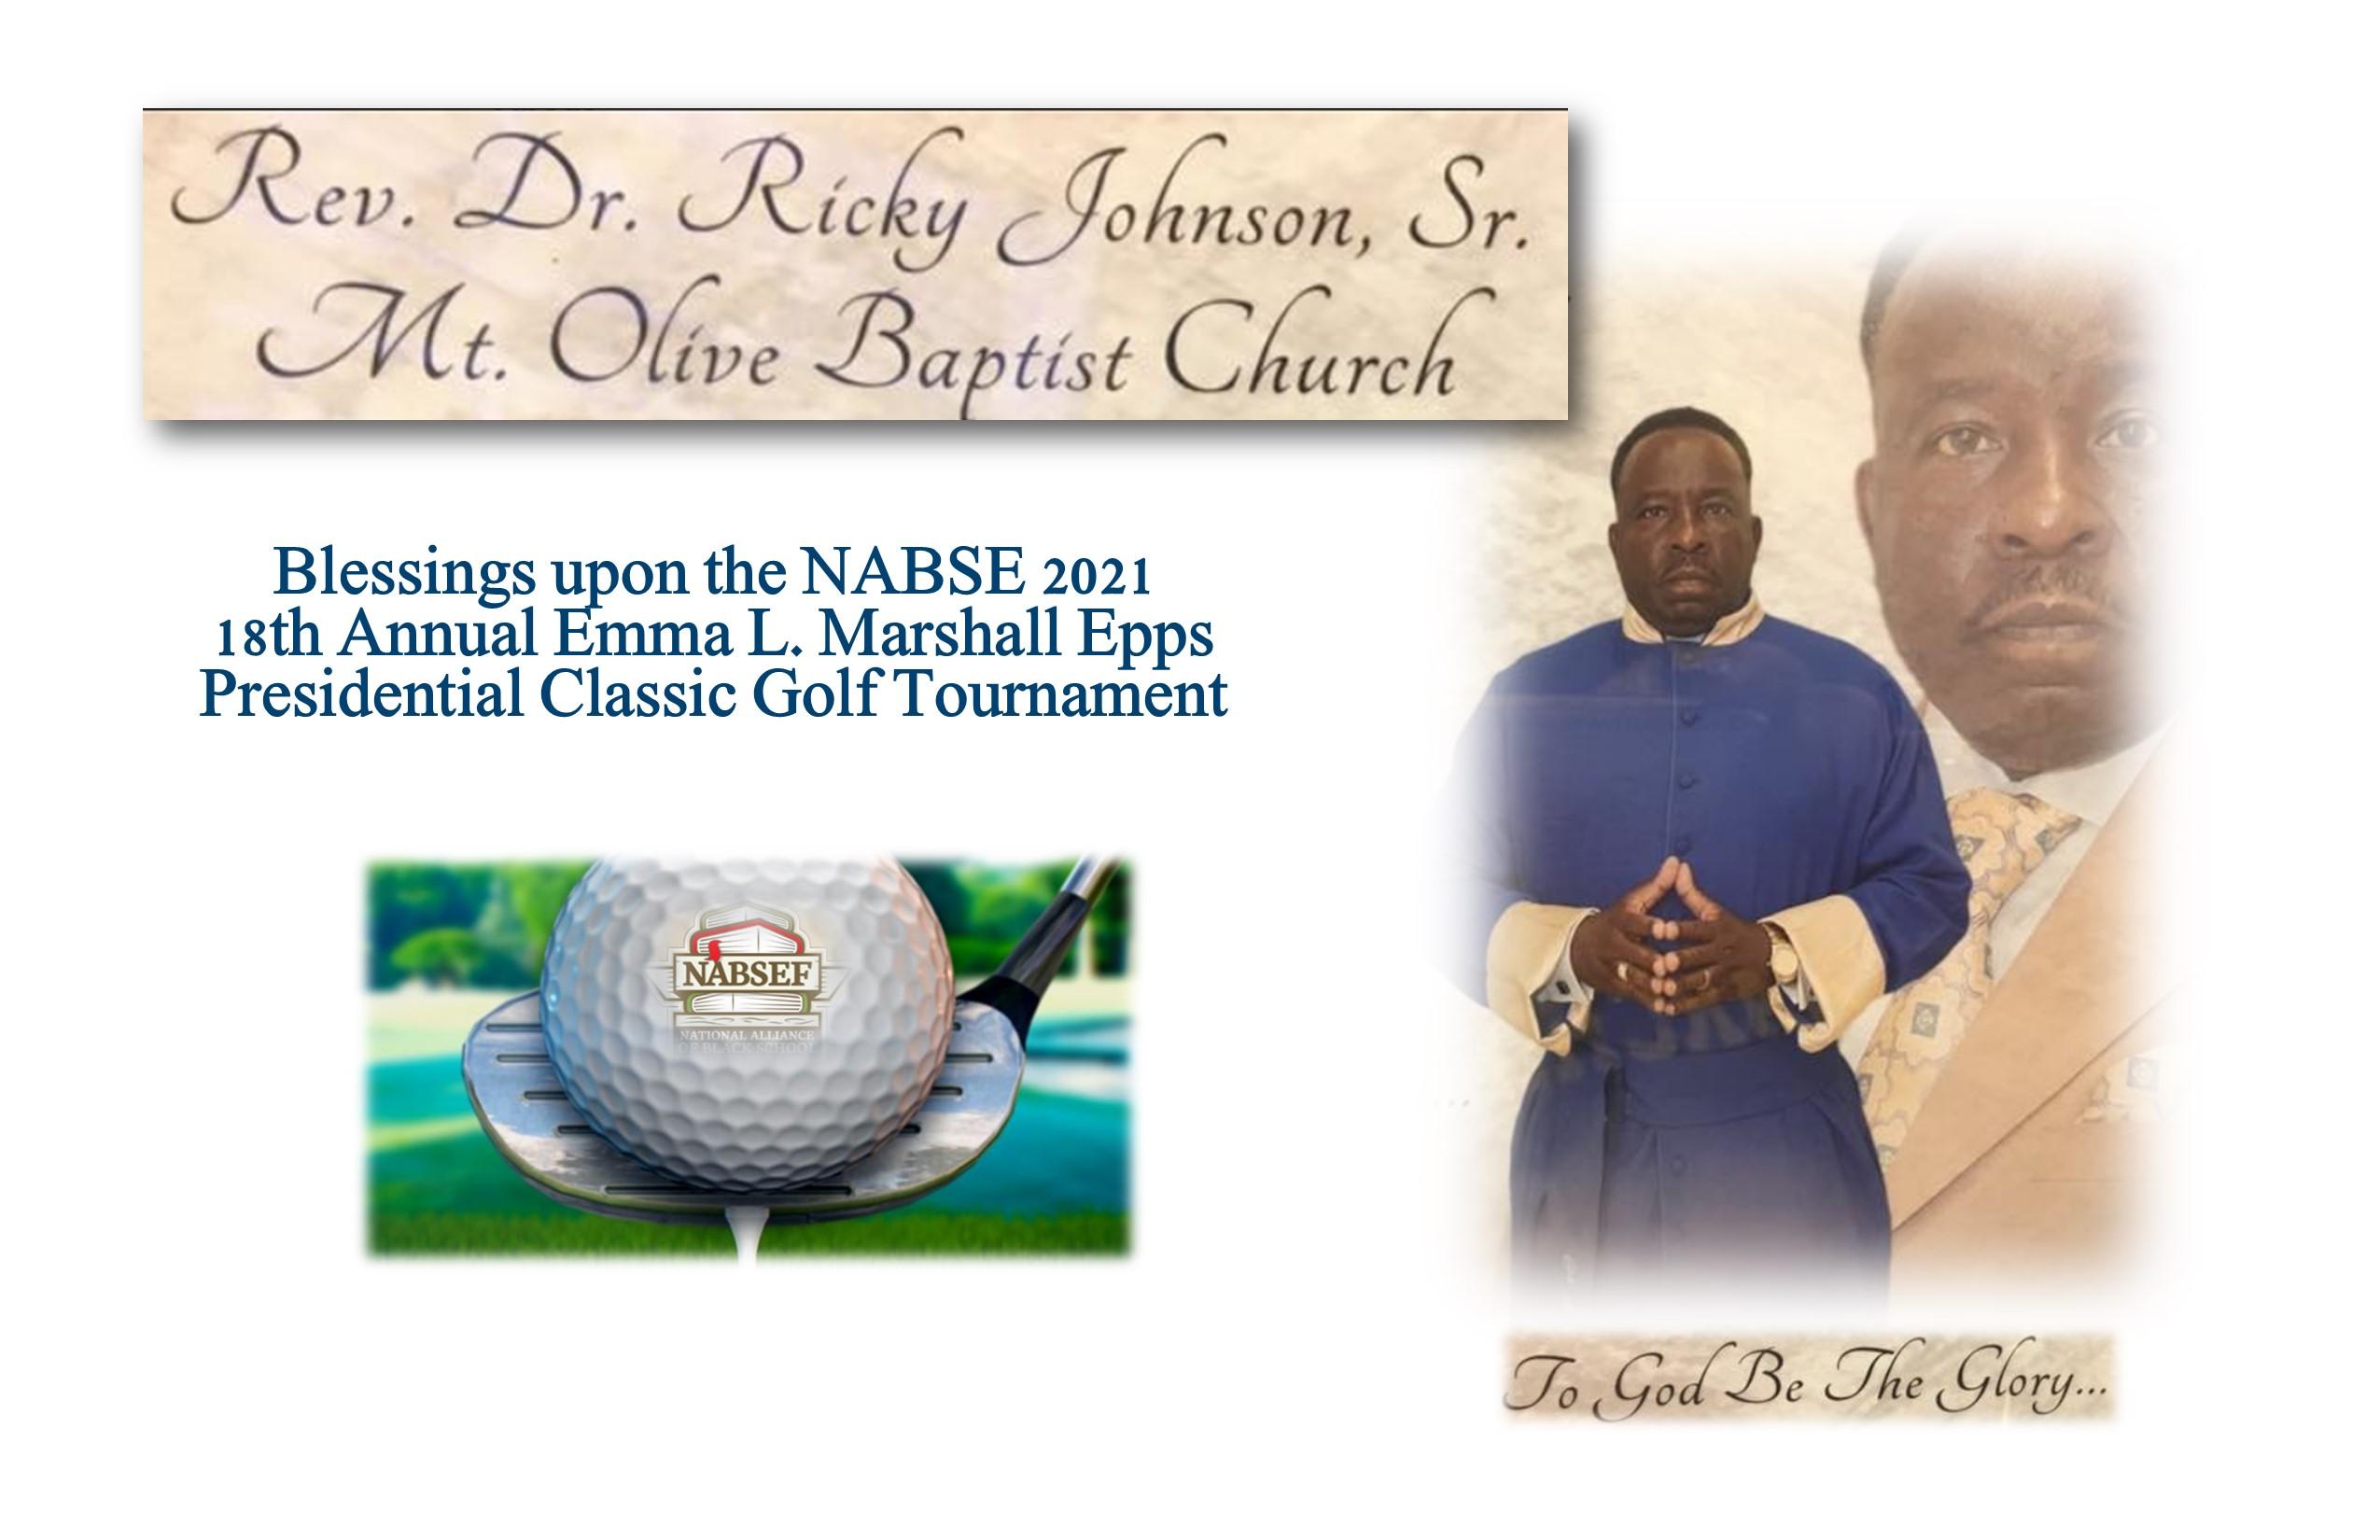 Rev Dr. Ricky Johnson, Sr. Mt Olive Baptist Church